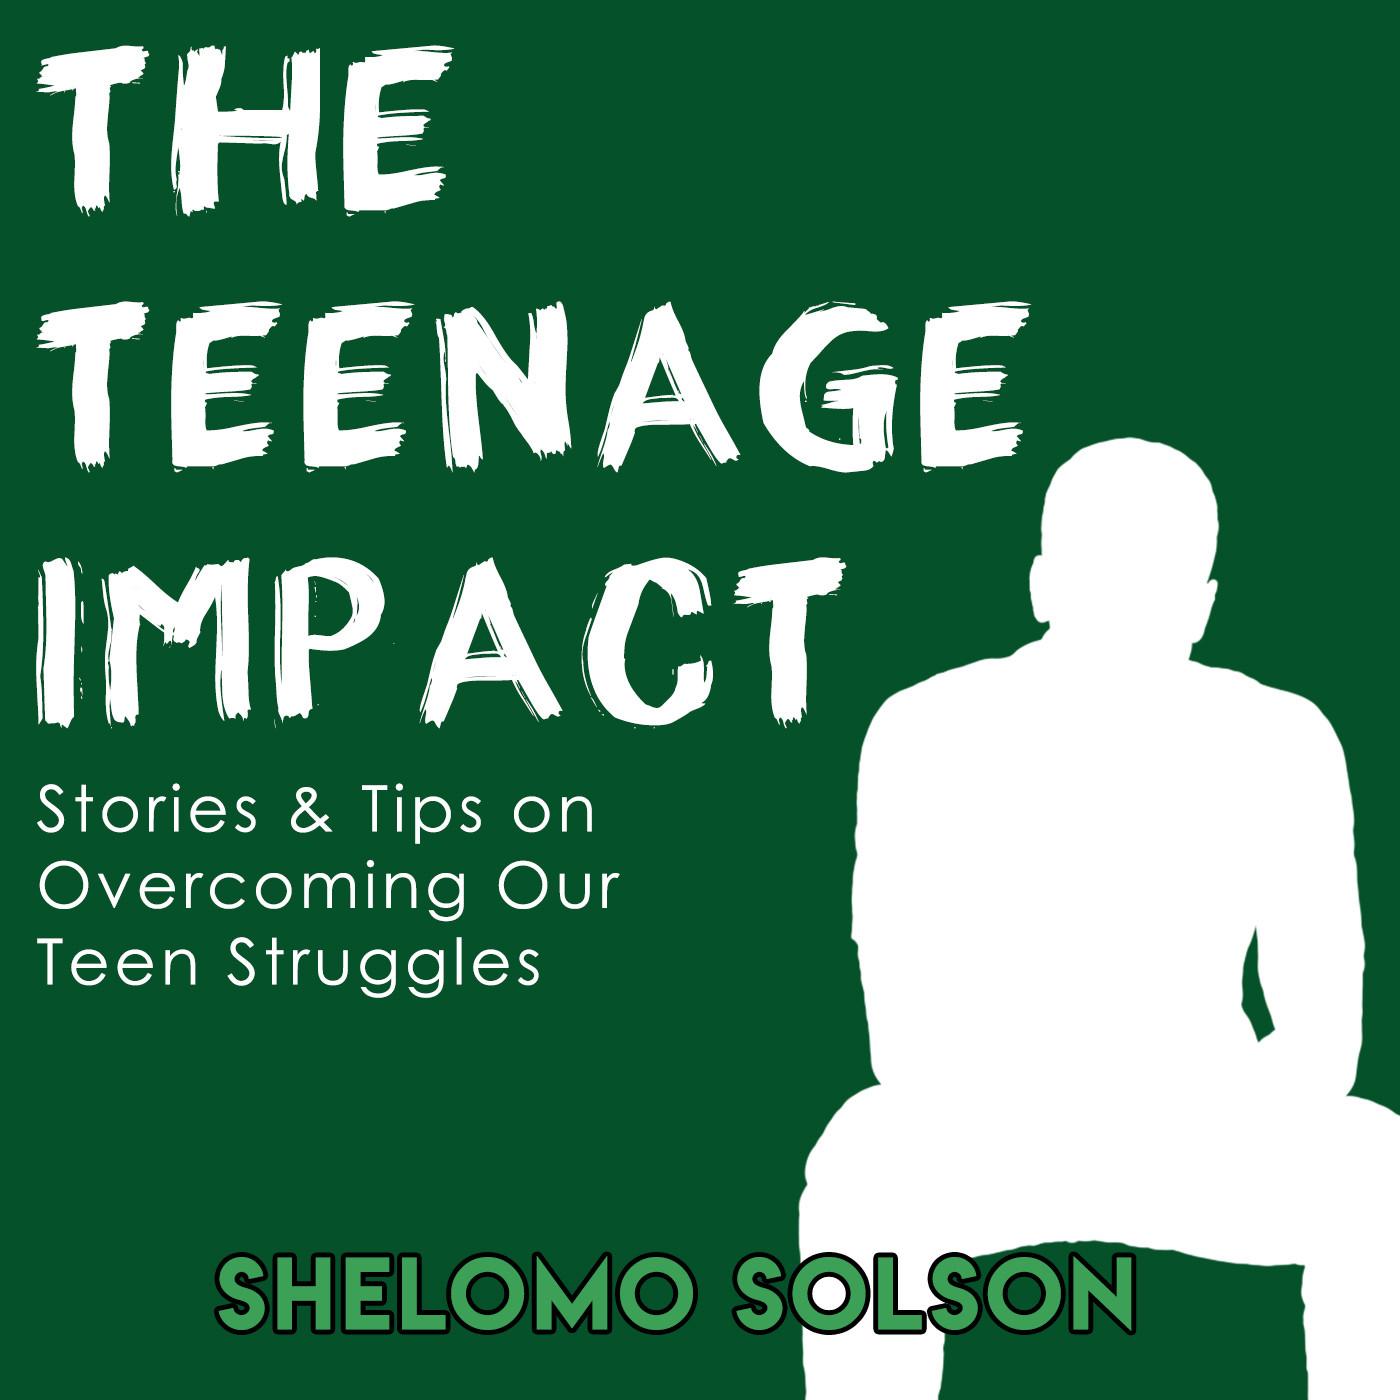 Ep #107: Having Children as a Teenager - Ms. Yogi